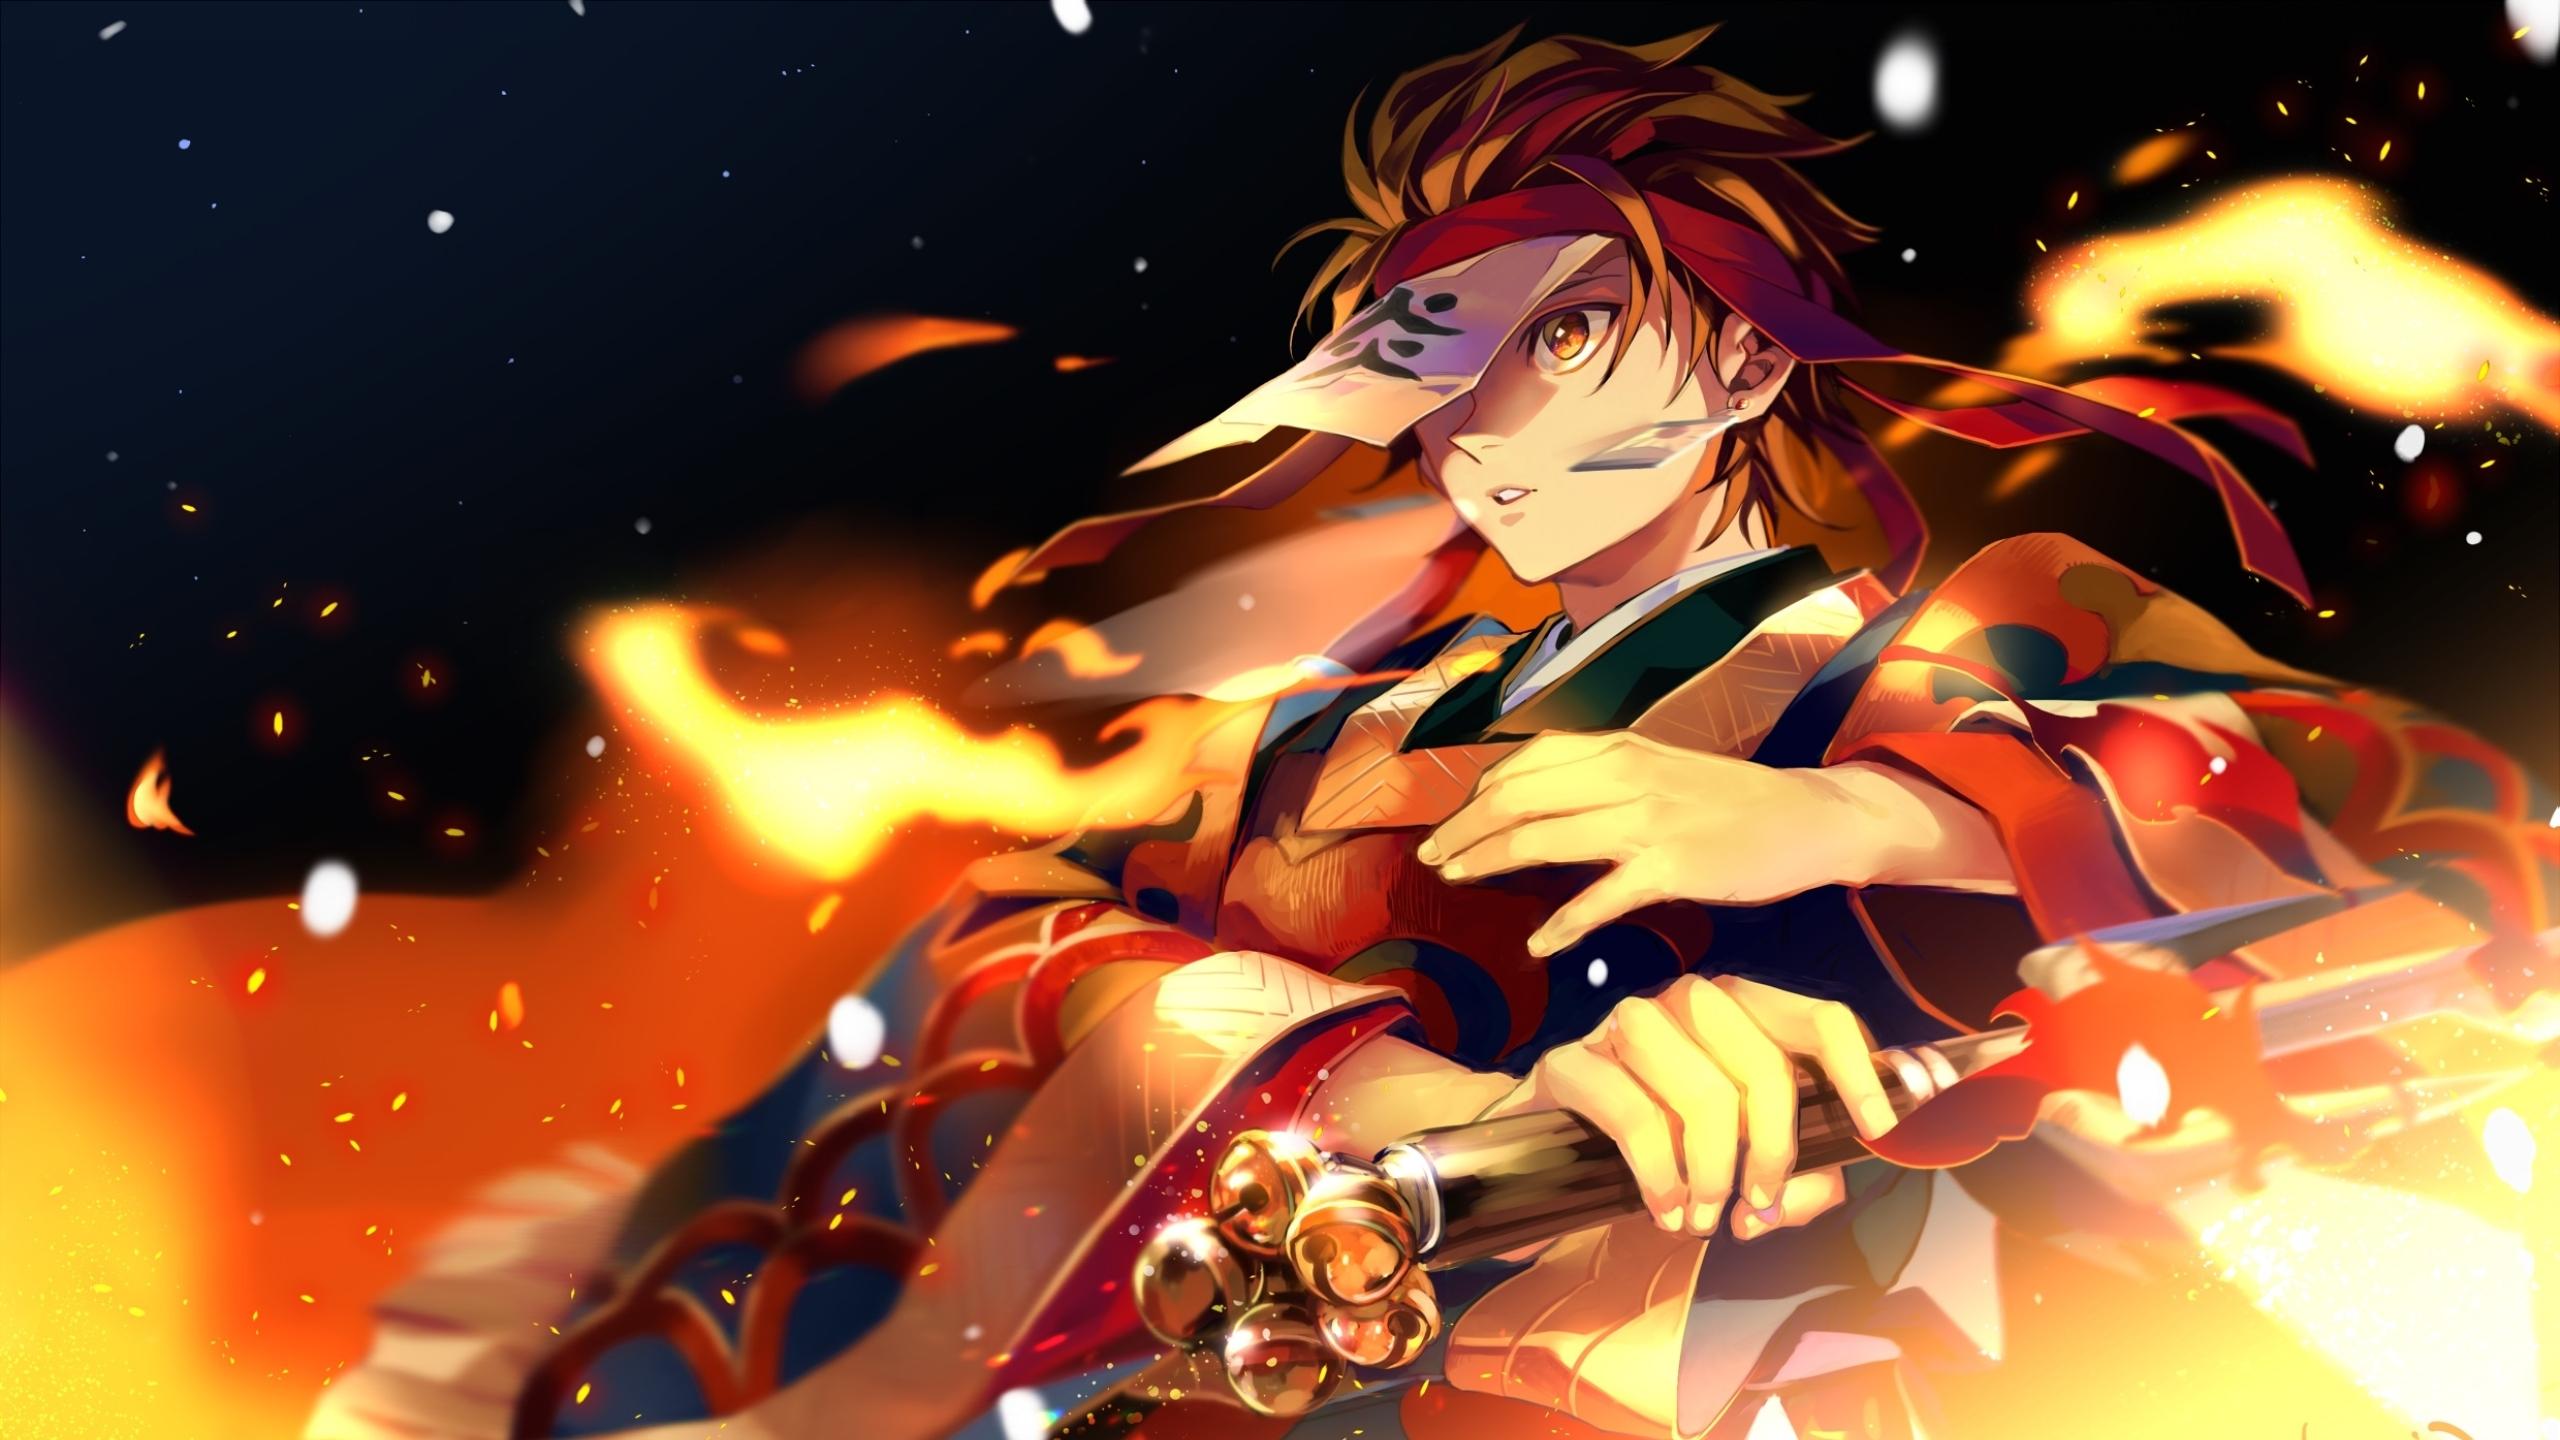 2560x1440 Dance Of The Fire God Hinokami Kagura 1440p